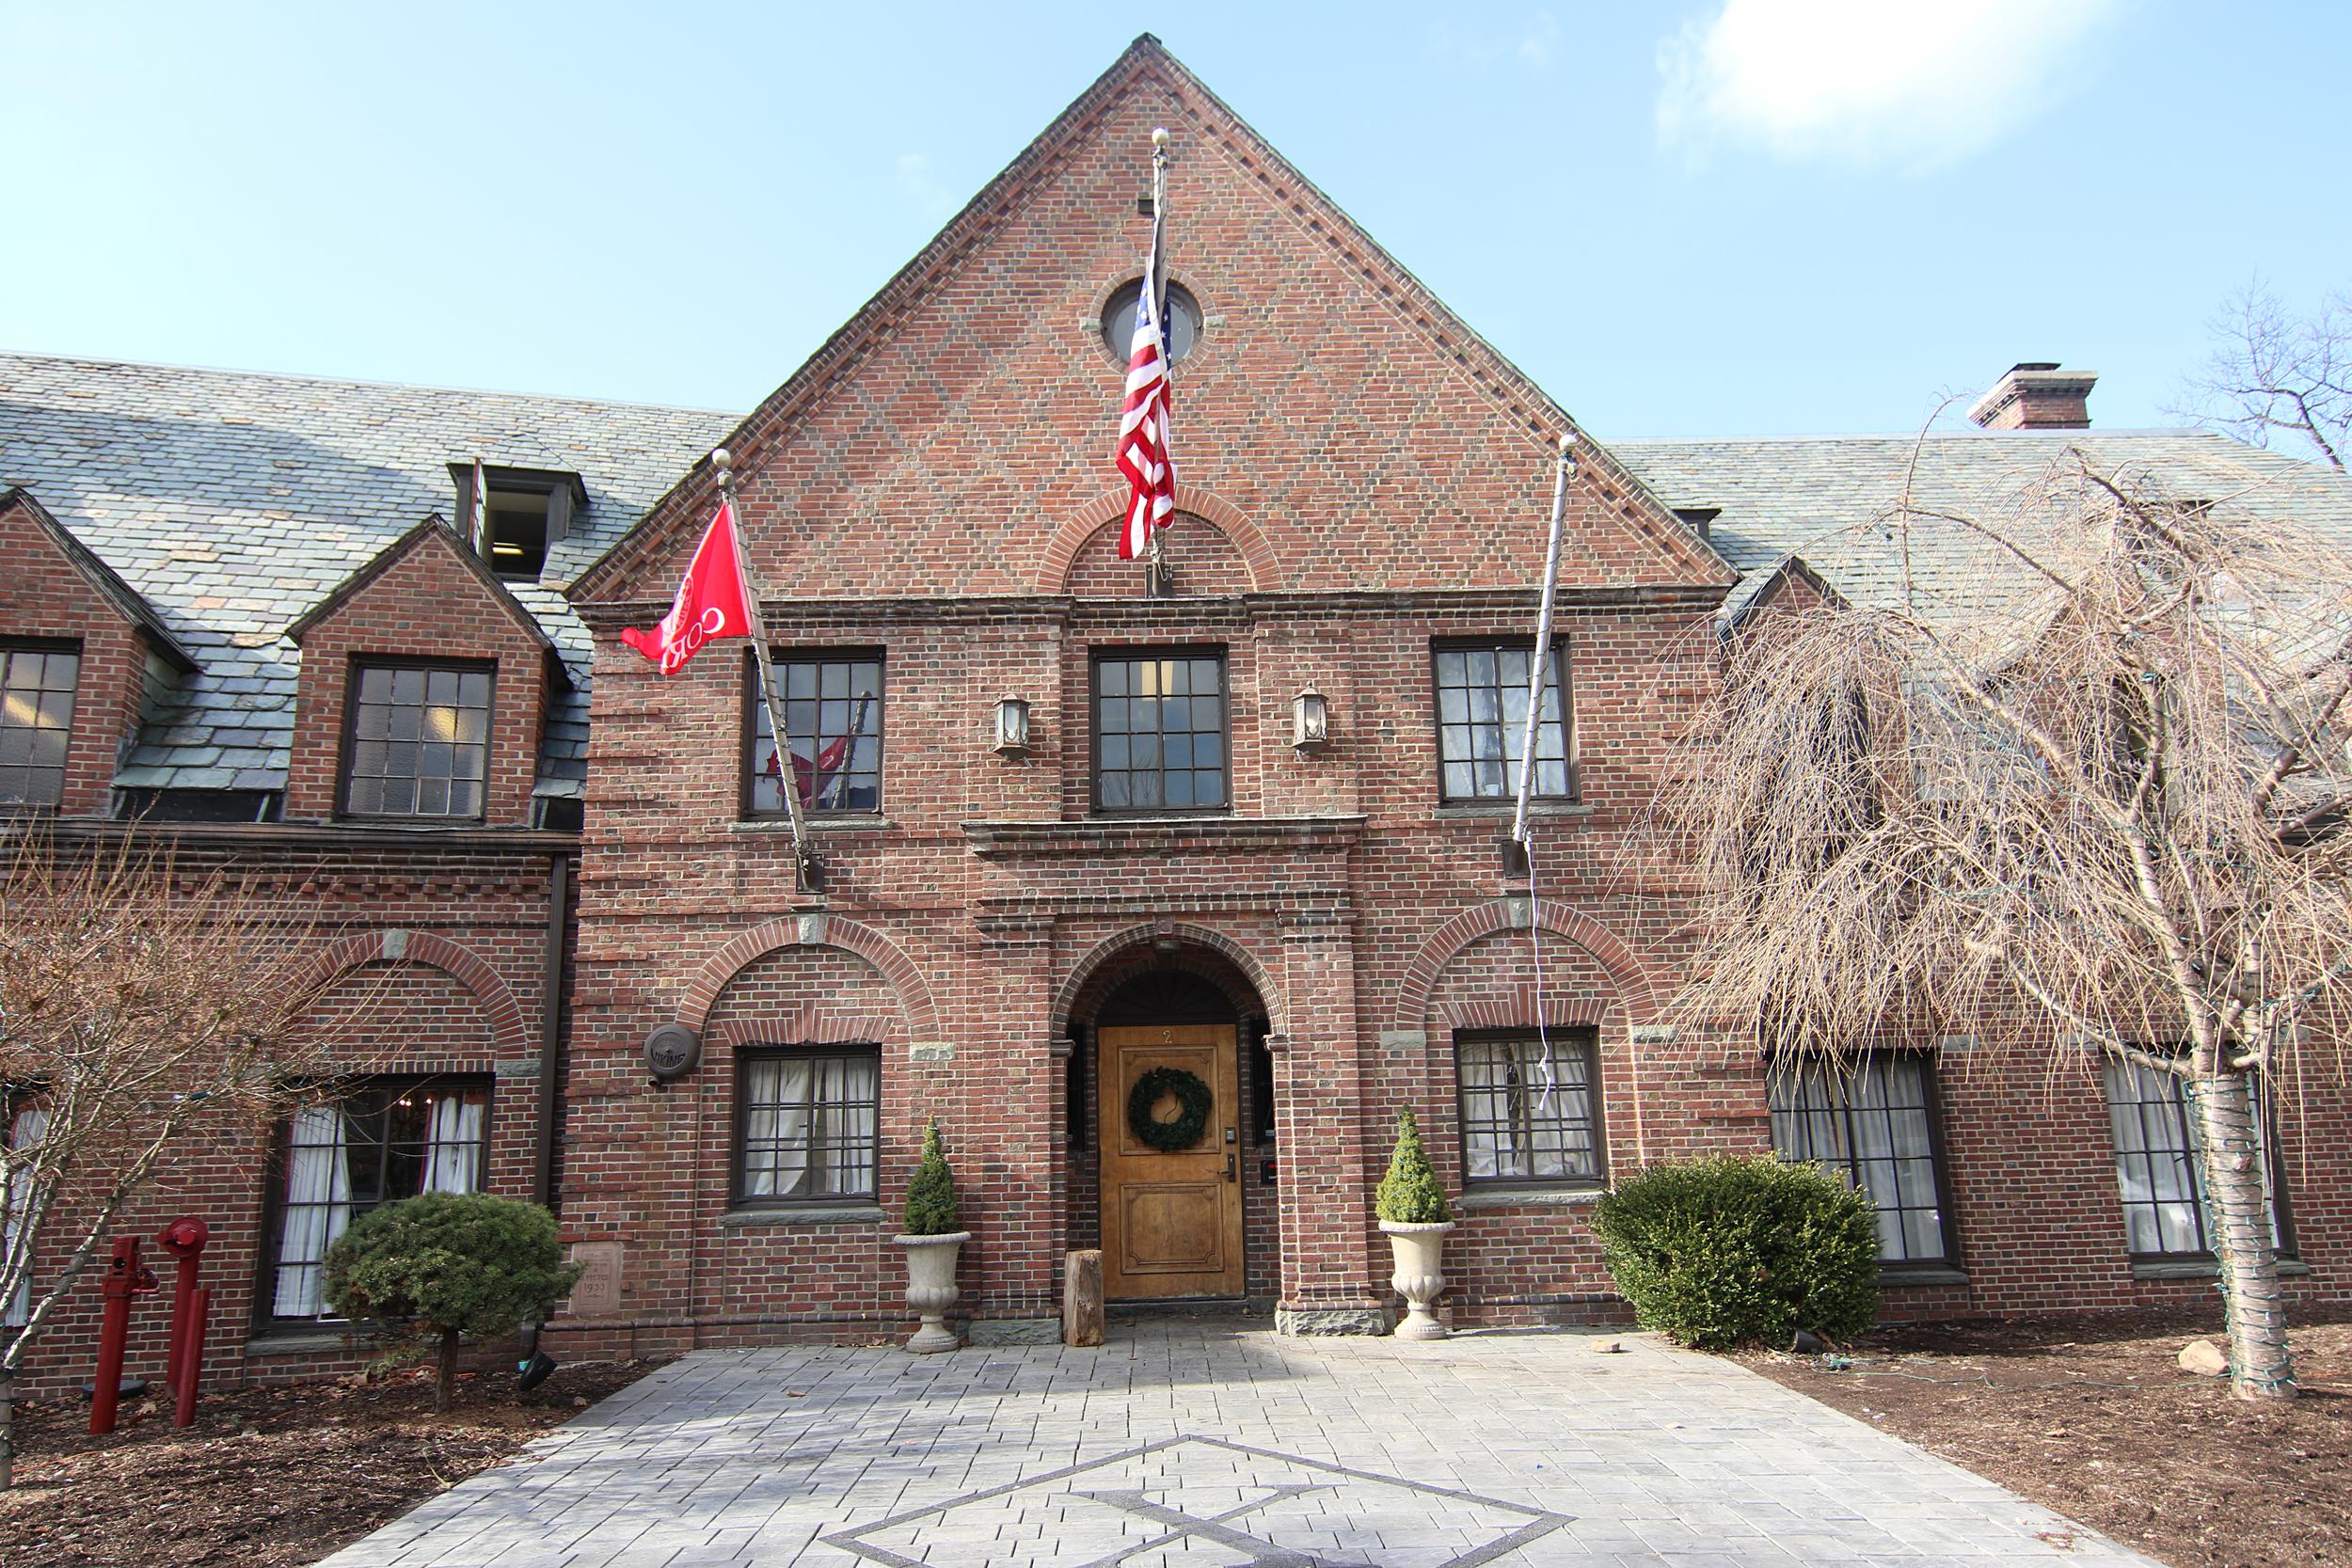 Image: Psi Upsilon fraternity house on west Campus of Cornell University.